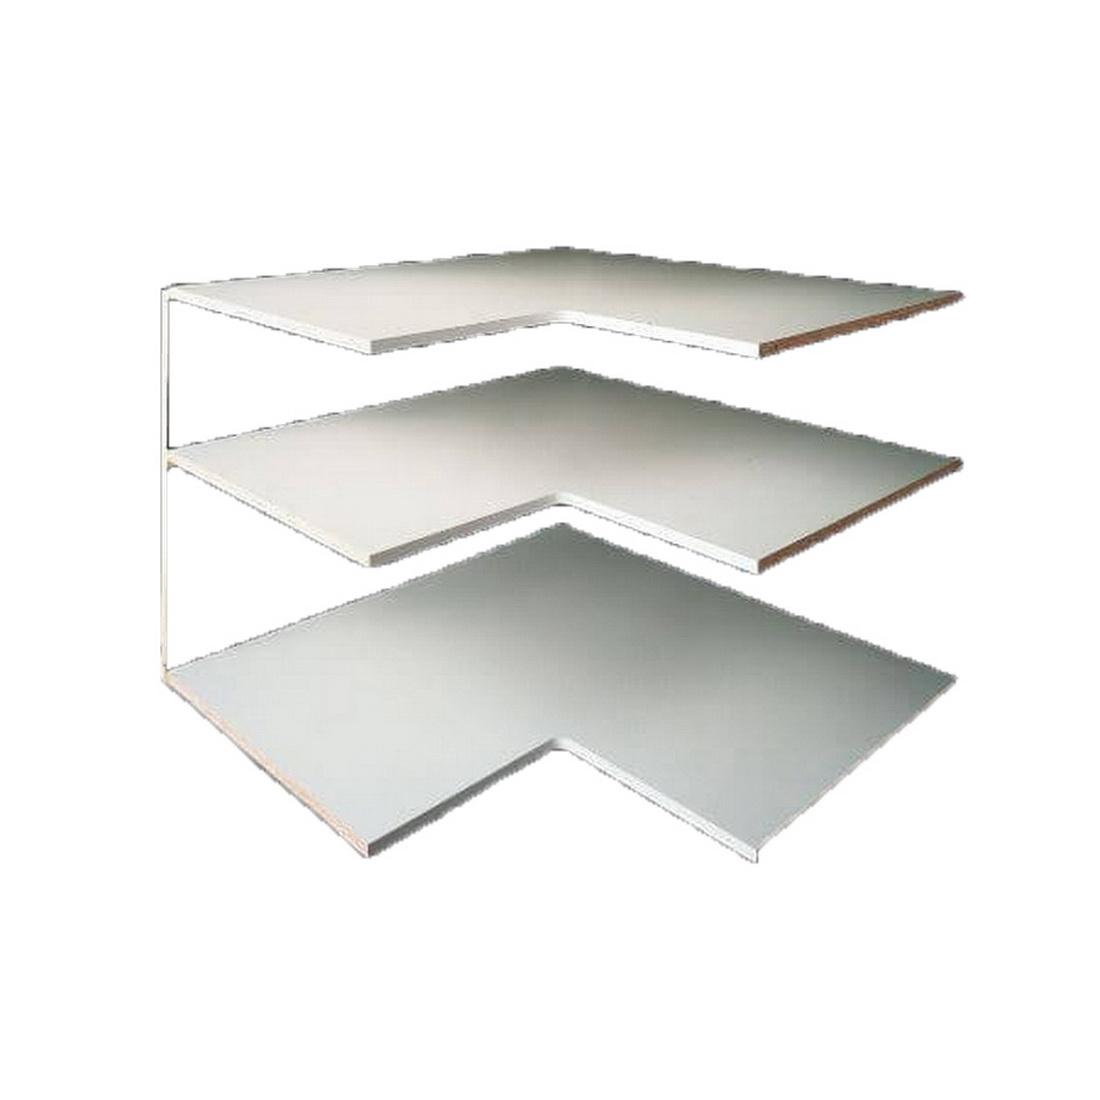 Laminex Whiteboard MDF Panel 2440 x 1220 x 16mm Gloss 872231